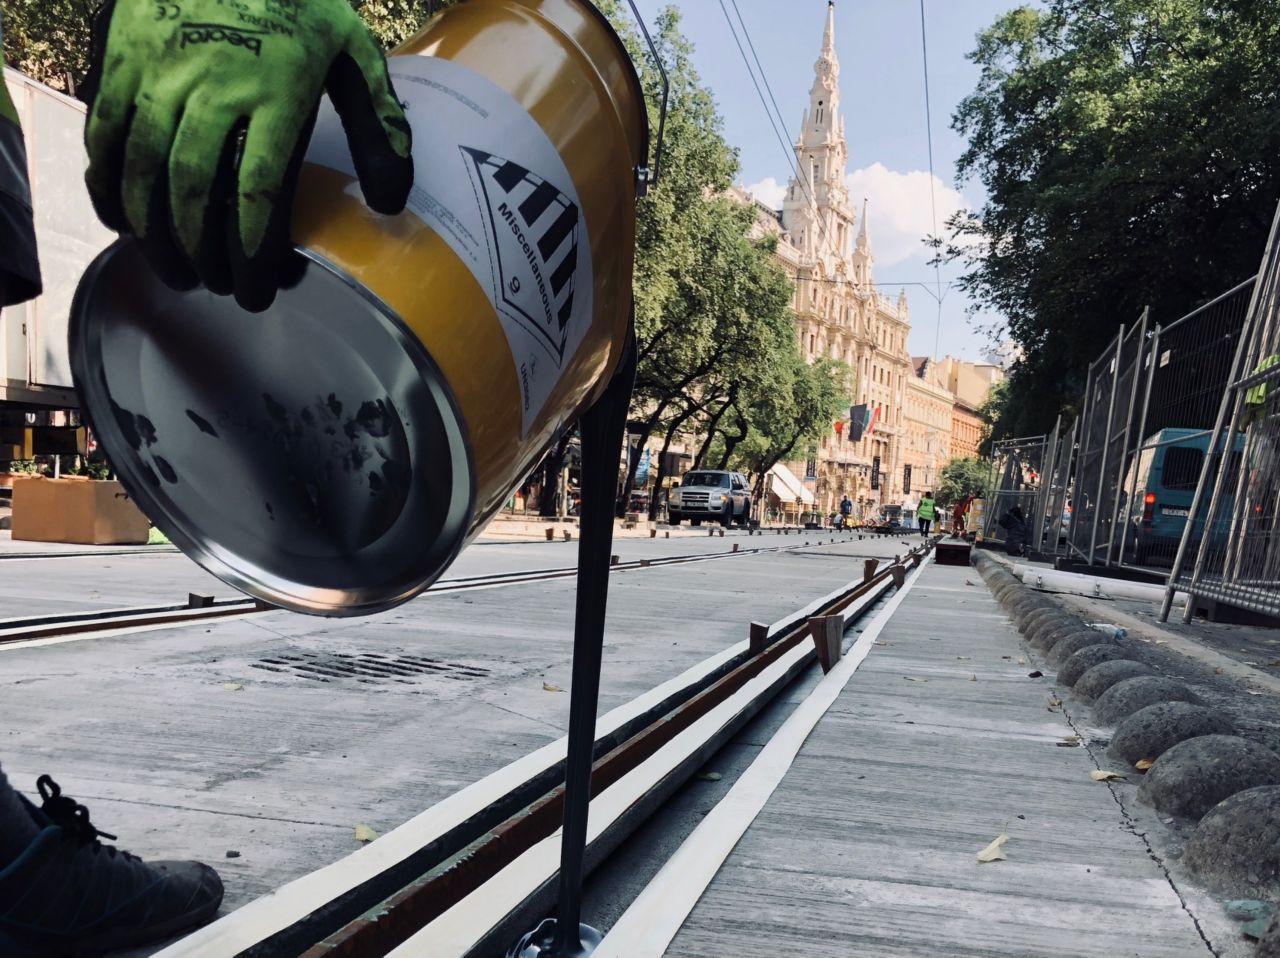 Fixing tram rail wiht epoxy grouting